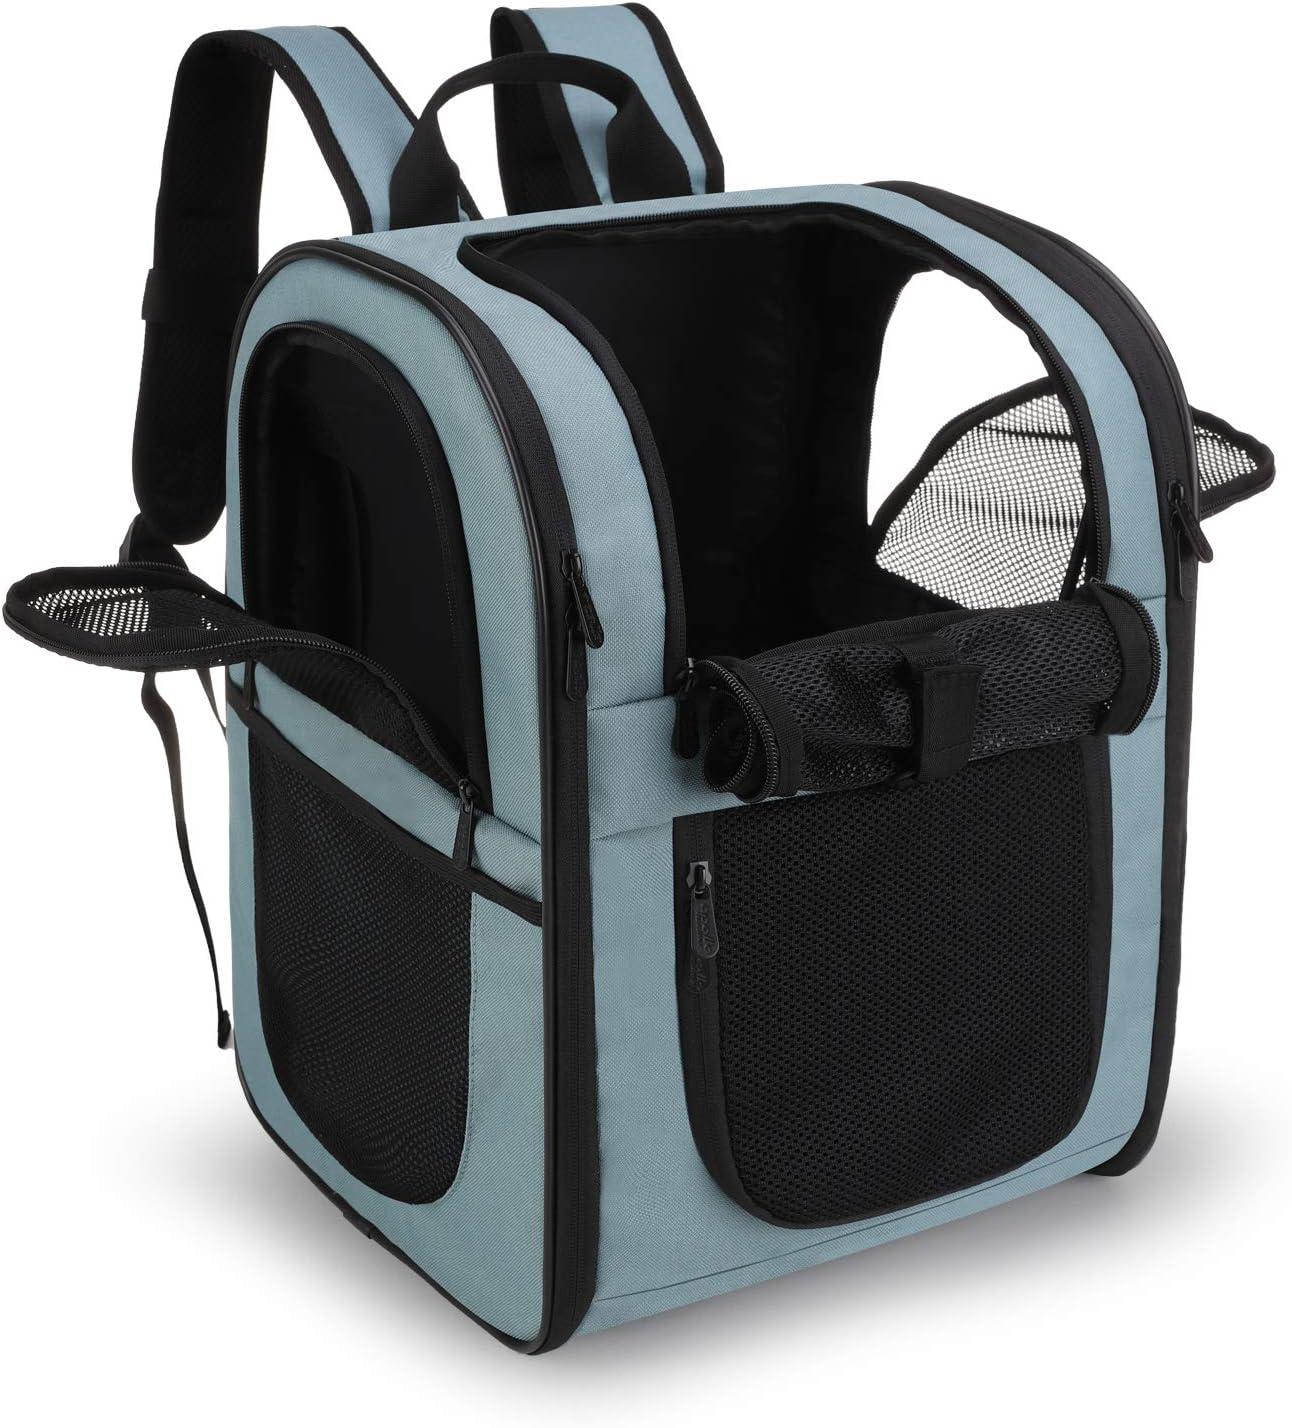 Dance Horse Art Deluxe Printing Small Purse Portable Receiving Bag